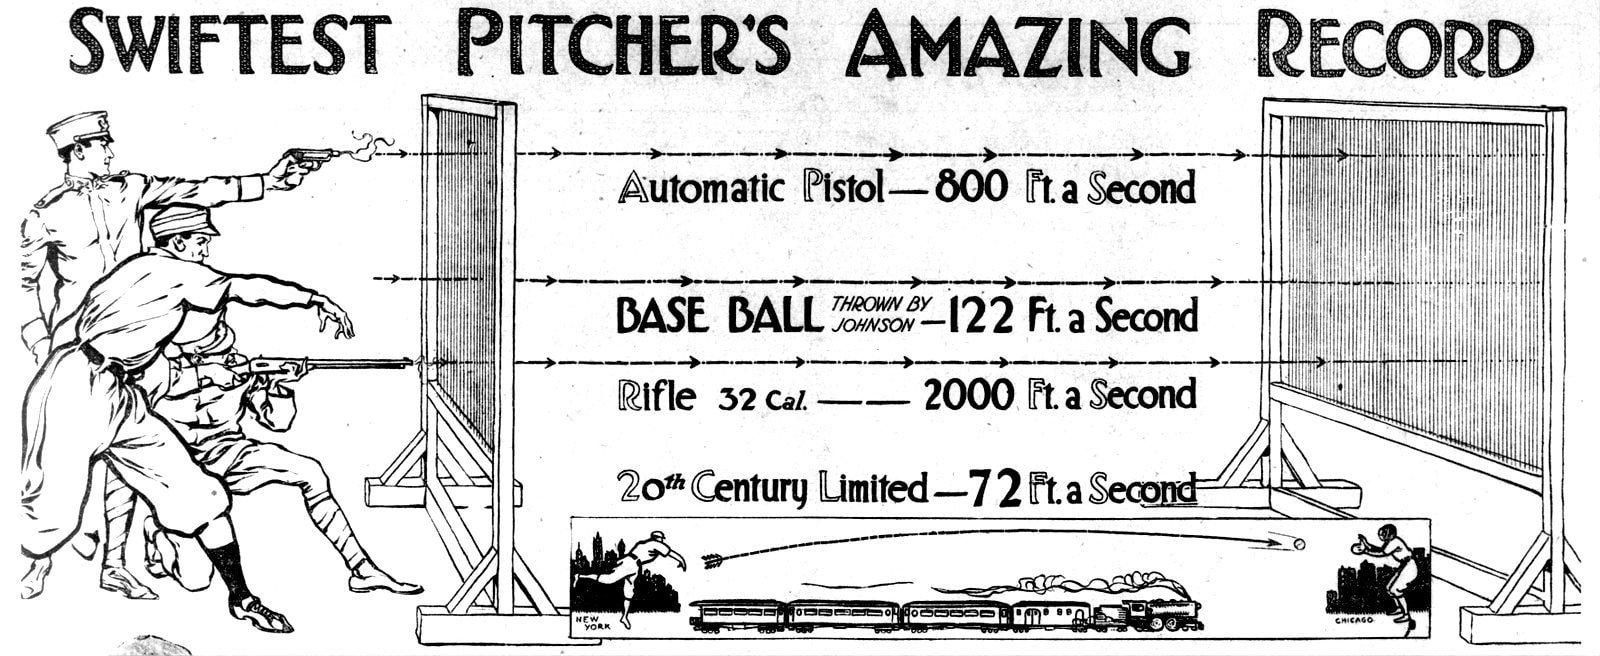 Walter Johnson - Swiftest pitcher's amazing record (1913)